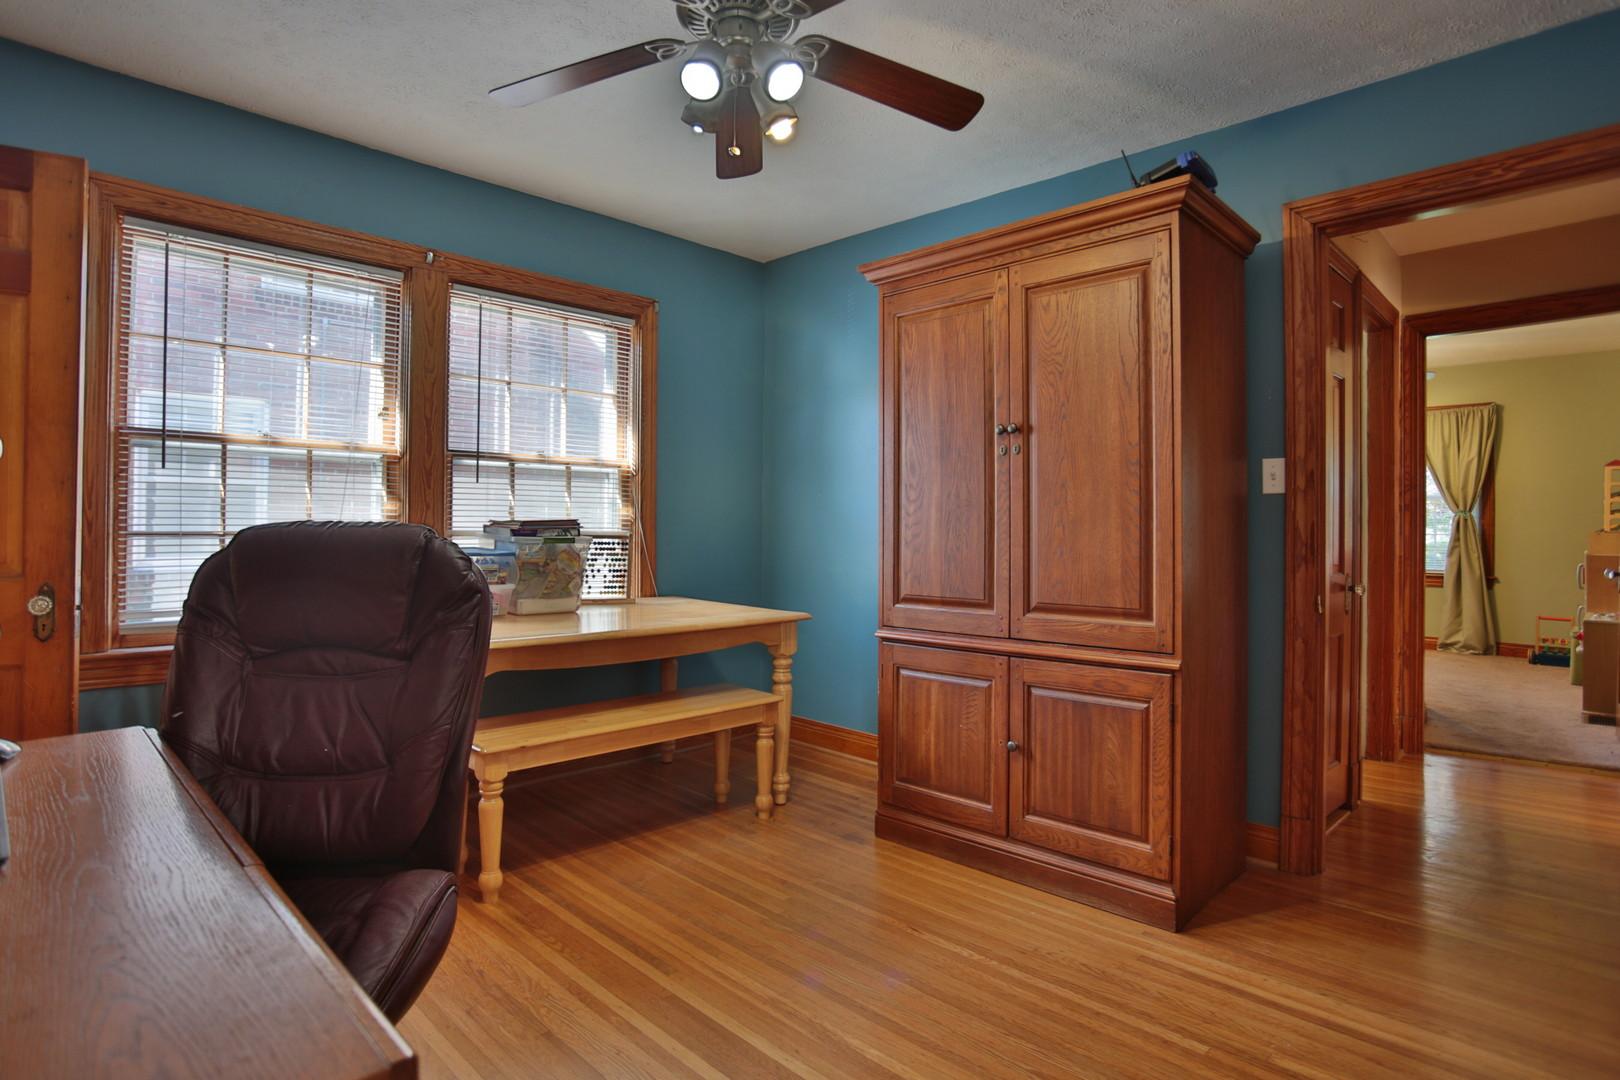 5603 W Southland Blvd. Louisville, KY 40214 Bedroom